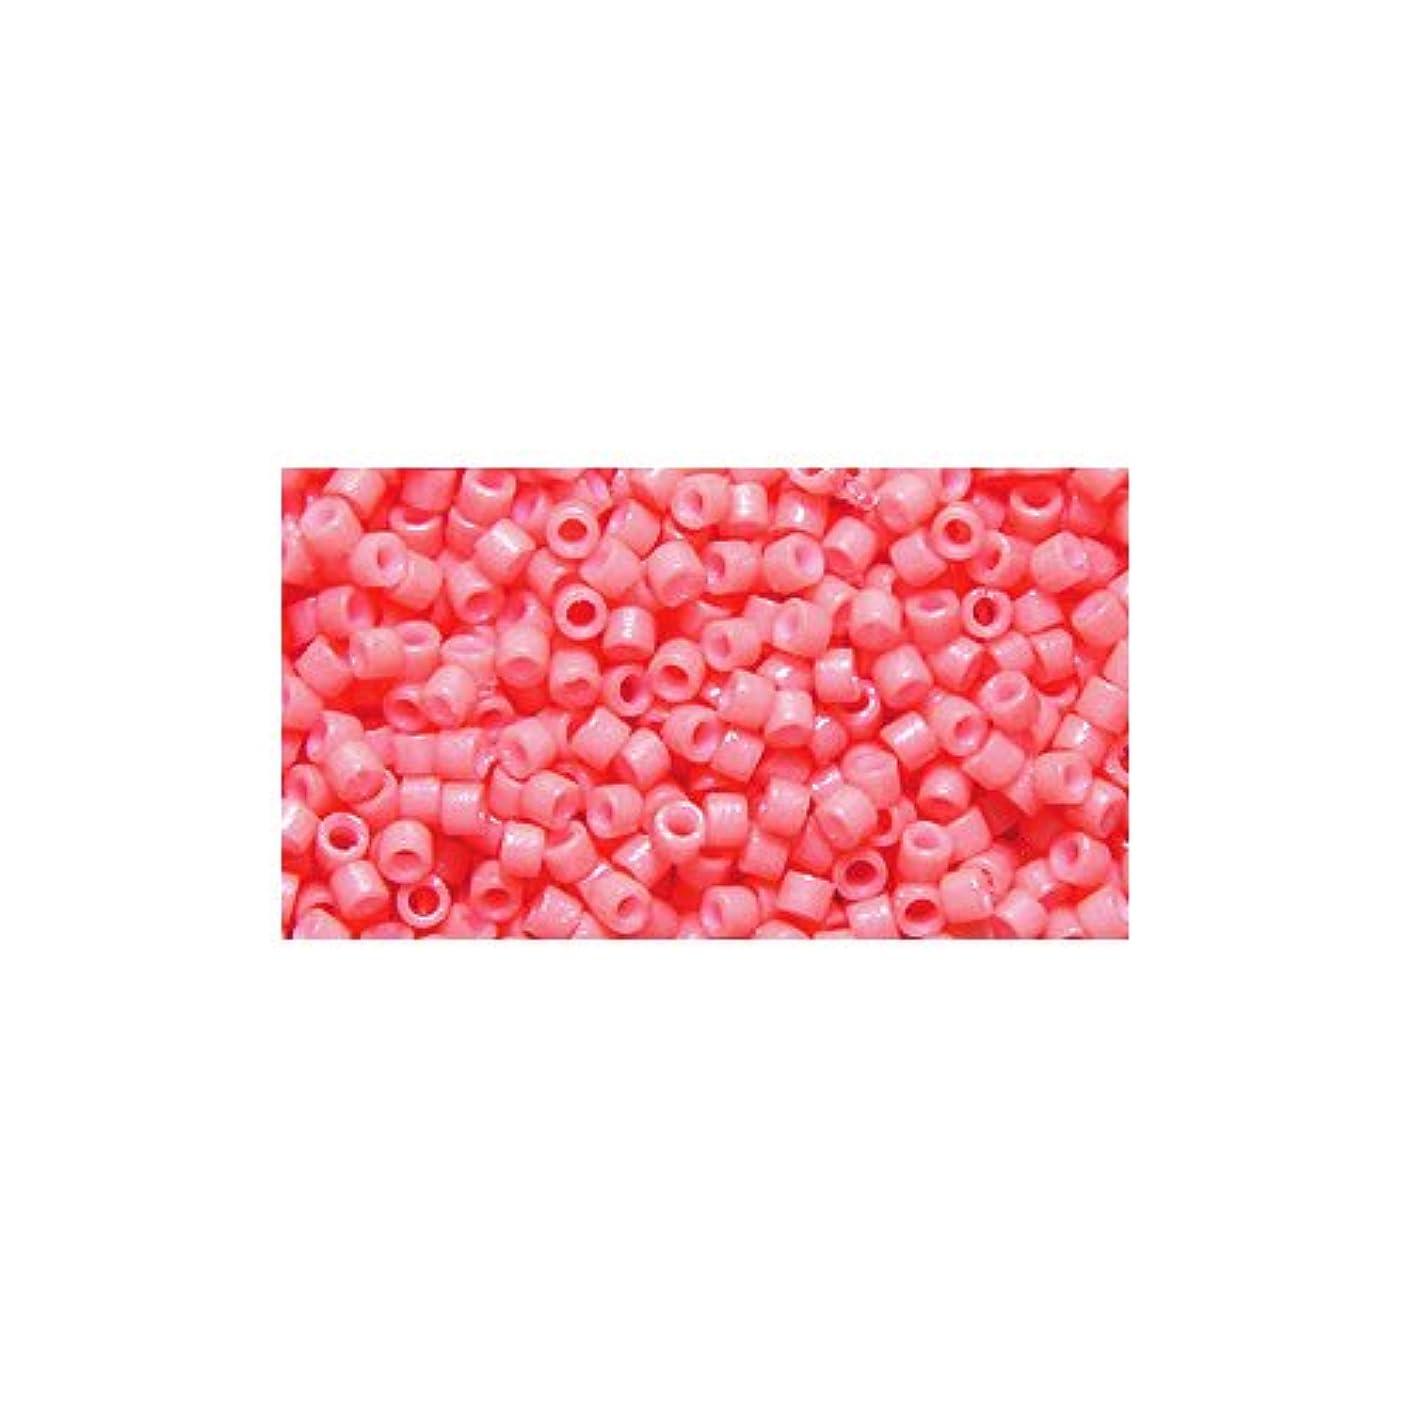 Miyuki Delica Seed Bead 11/0 DB2112, Duracoat Dark Salmon, 9-Gram/Pack